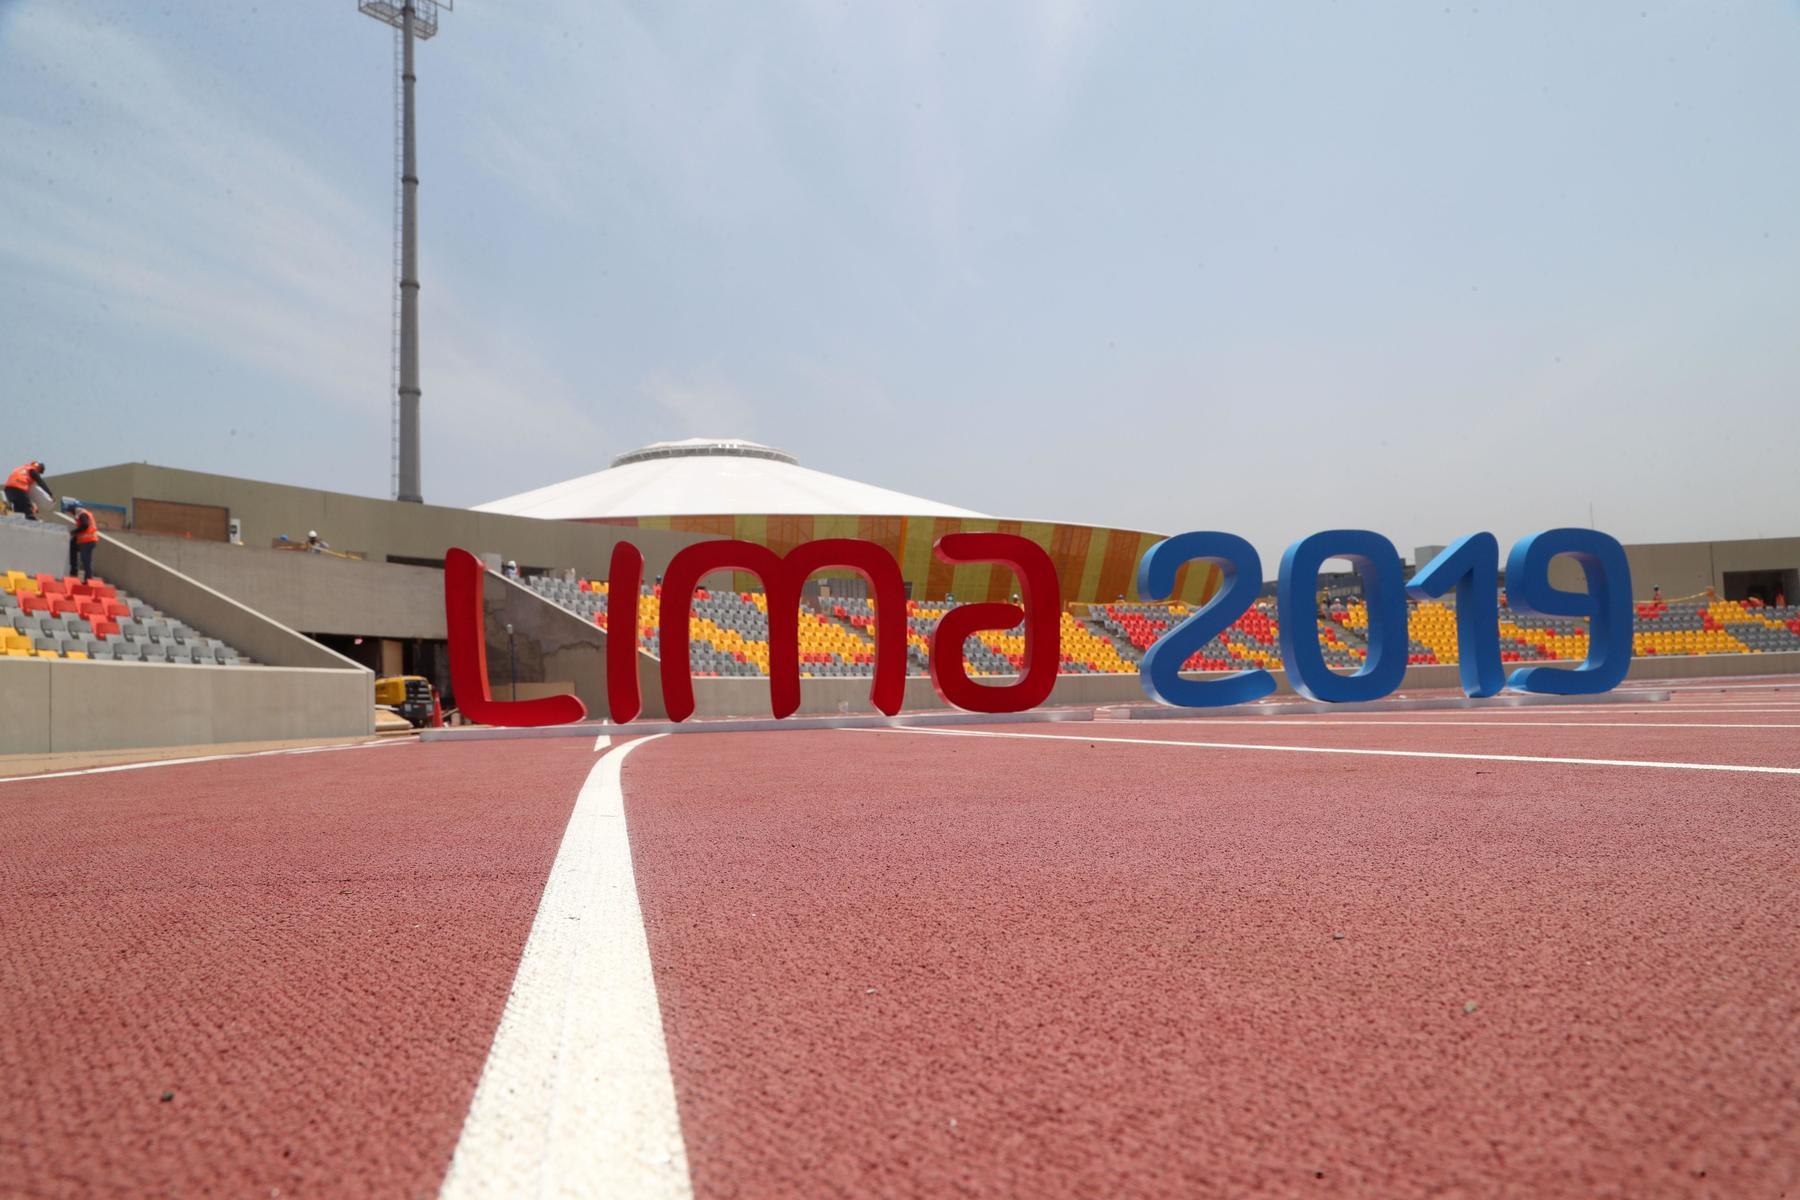 Calendario Juegos Panamericanos Lima 2019 Entradas.Juegos Panamericanos A 50 Dias De Lima 2019 Se Vendieron